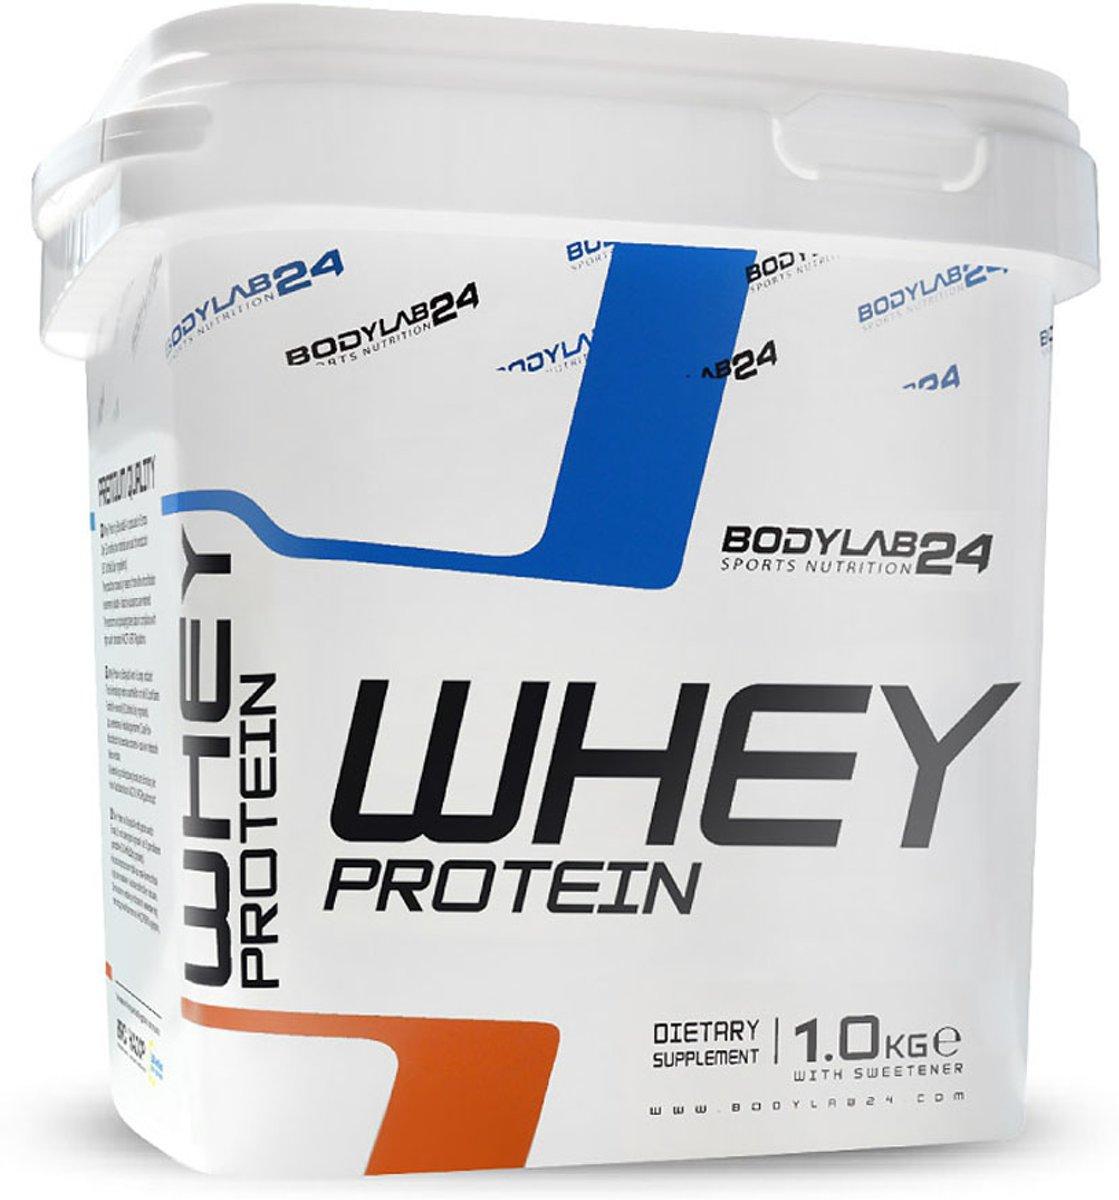 Bodylab24 Whey Protein - 1000 gram - Cherry Yoghurt kopen